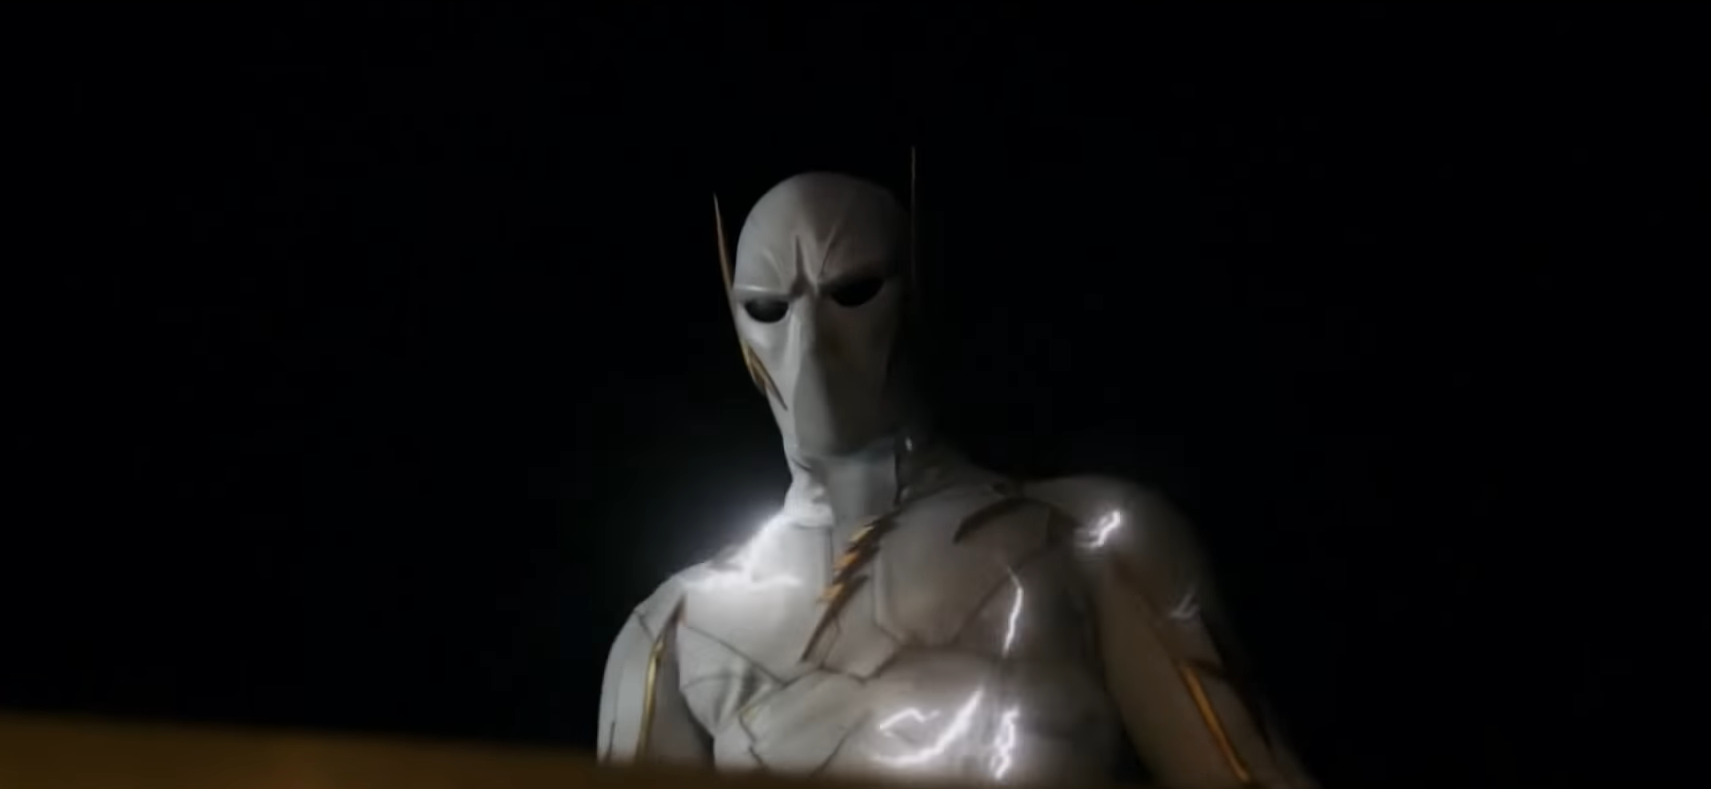 Season 7 Of The Flash To Feature Long Awaited Villain Godspeed Mxdwn Television